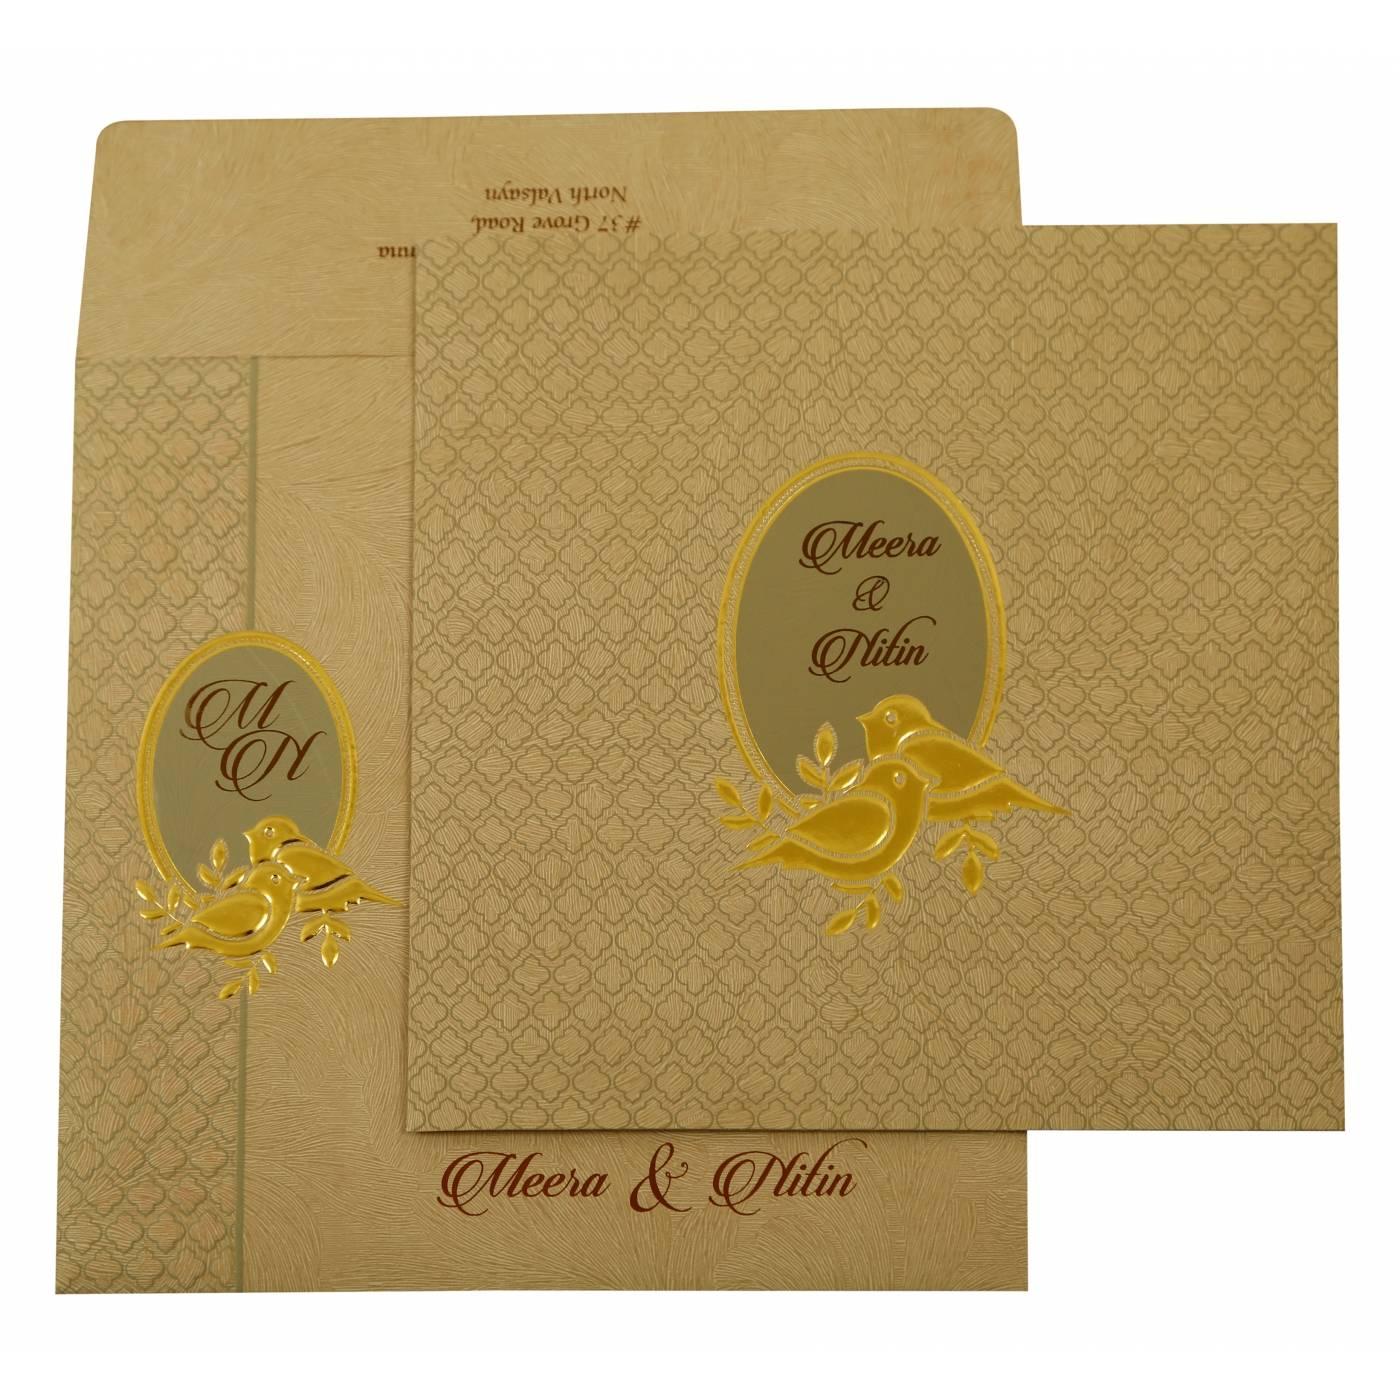 GREY MATTE FOIL STAMPED WEDDING INVITATION : CS-1885 - IndianWeddingCards